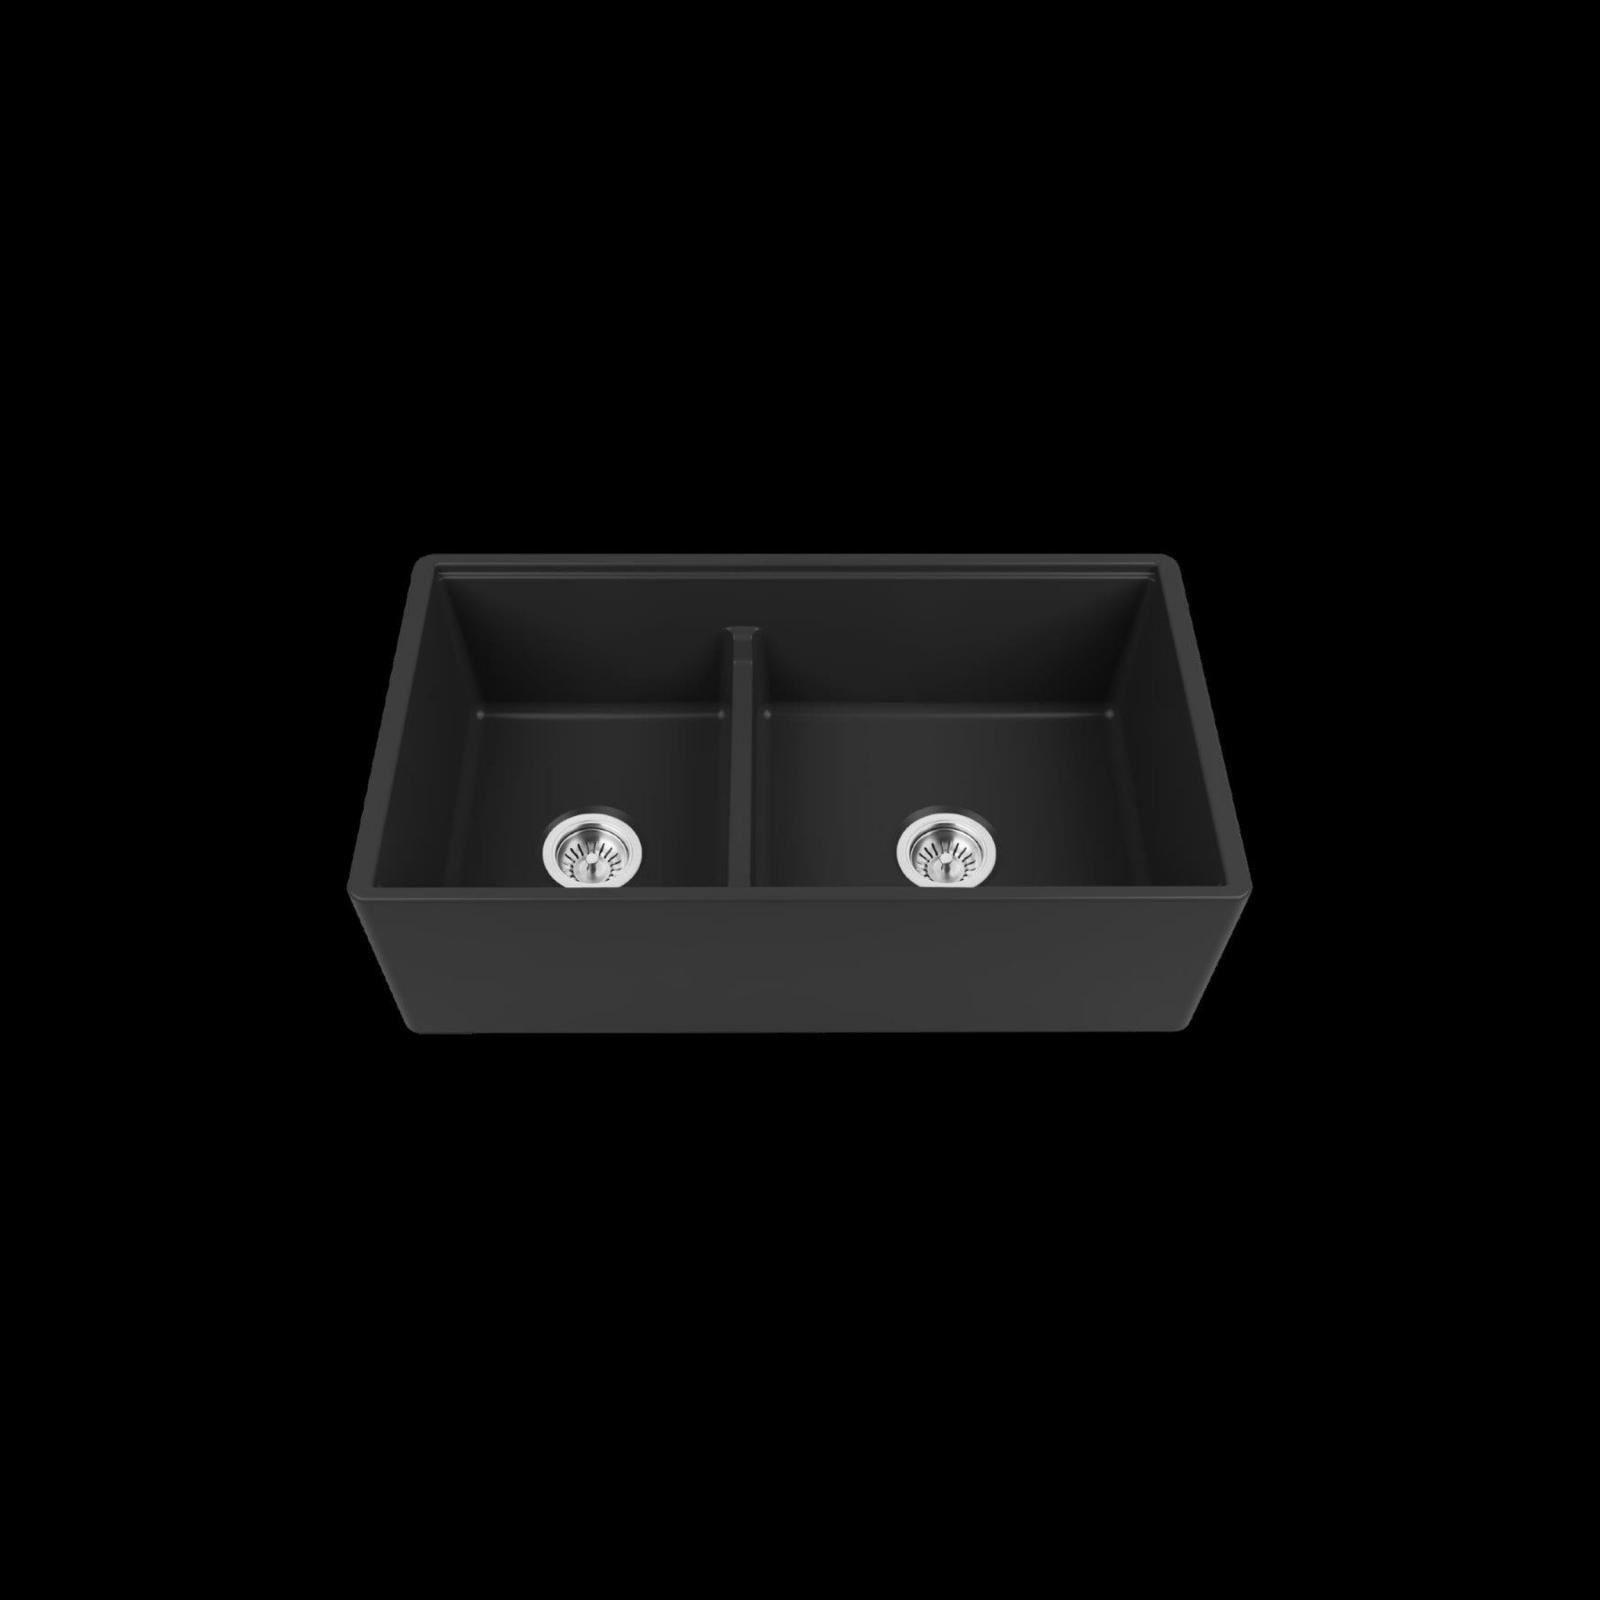 High-quality sink Louis Le Grand II black - single bowl, ceramic - 2